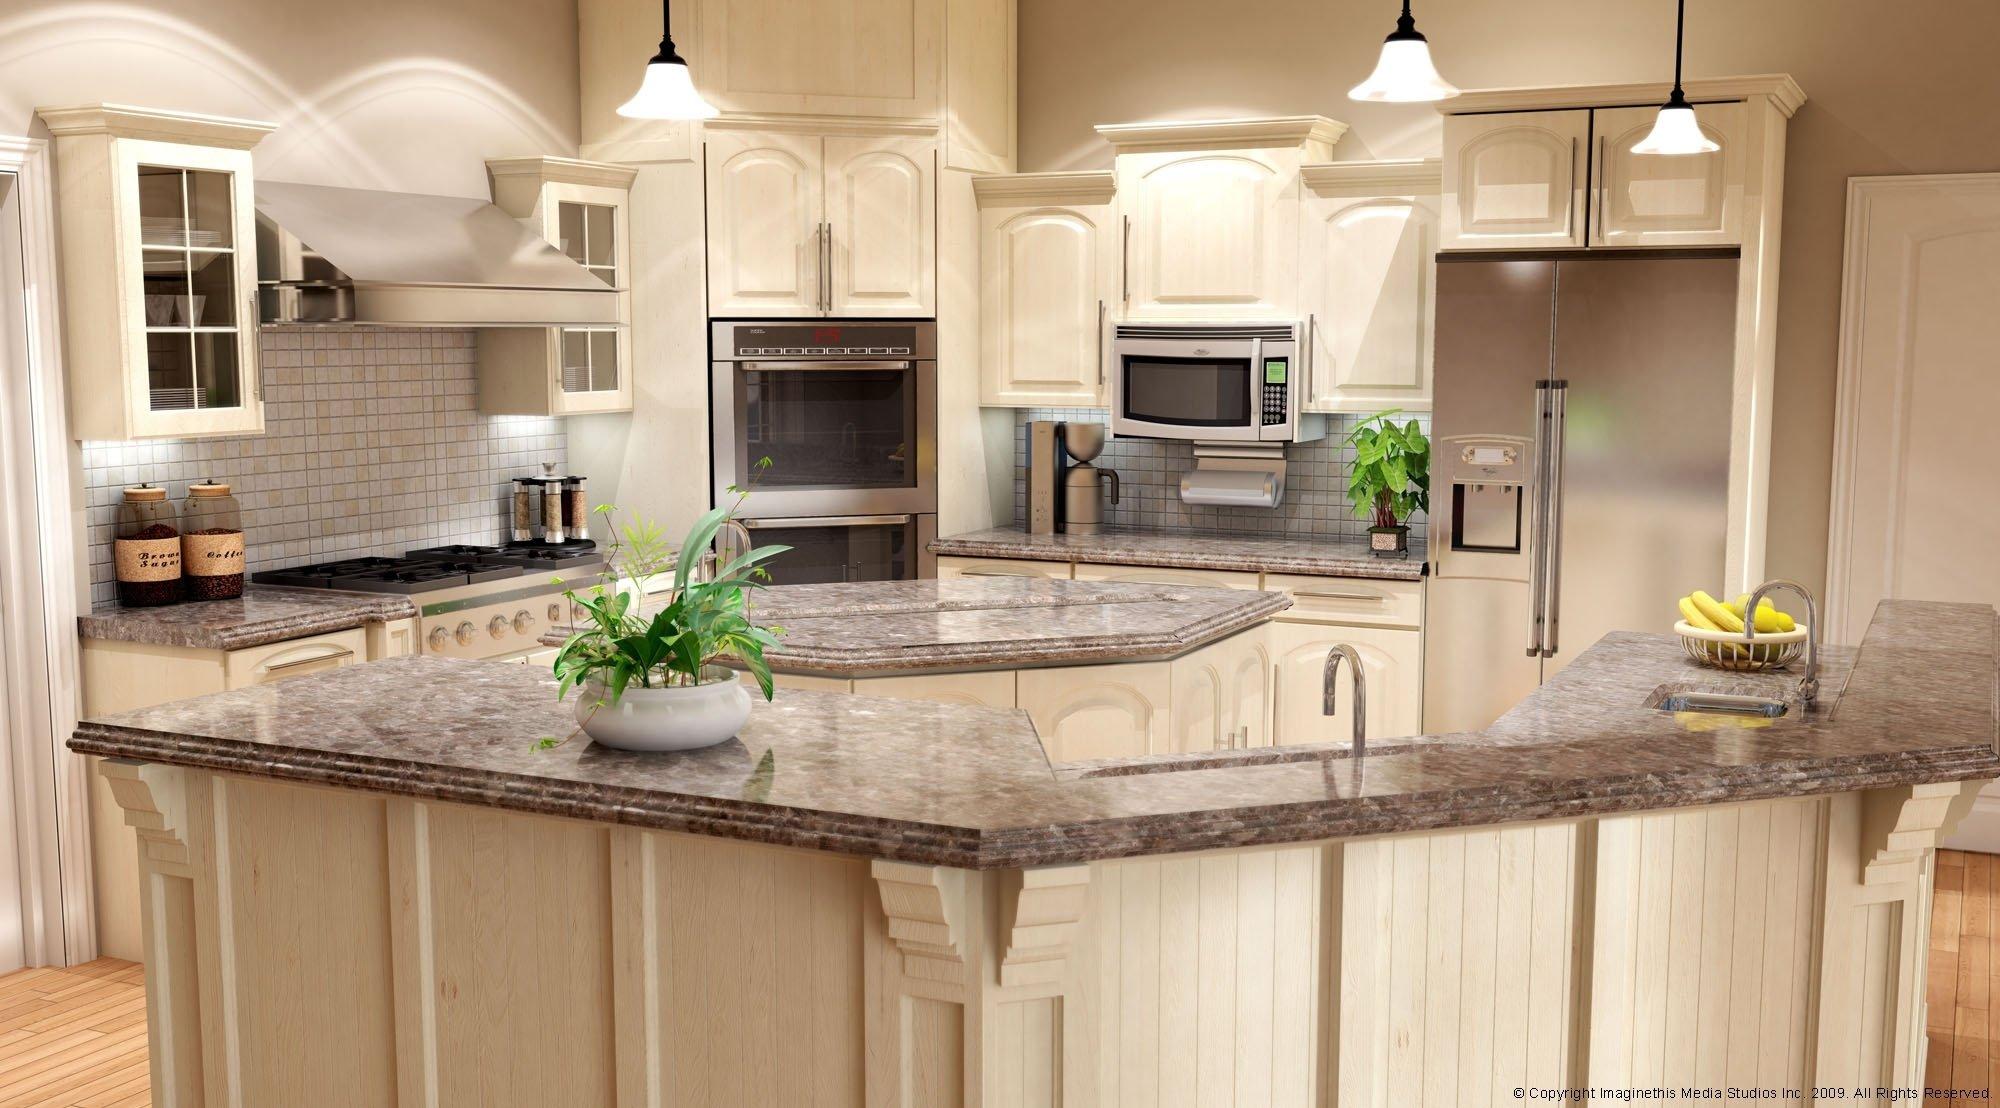 10 Gorgeous Kitchen Ideas With White Cabinets white kitchen cabinet ideas with gray granite countertop eva furniture 2020